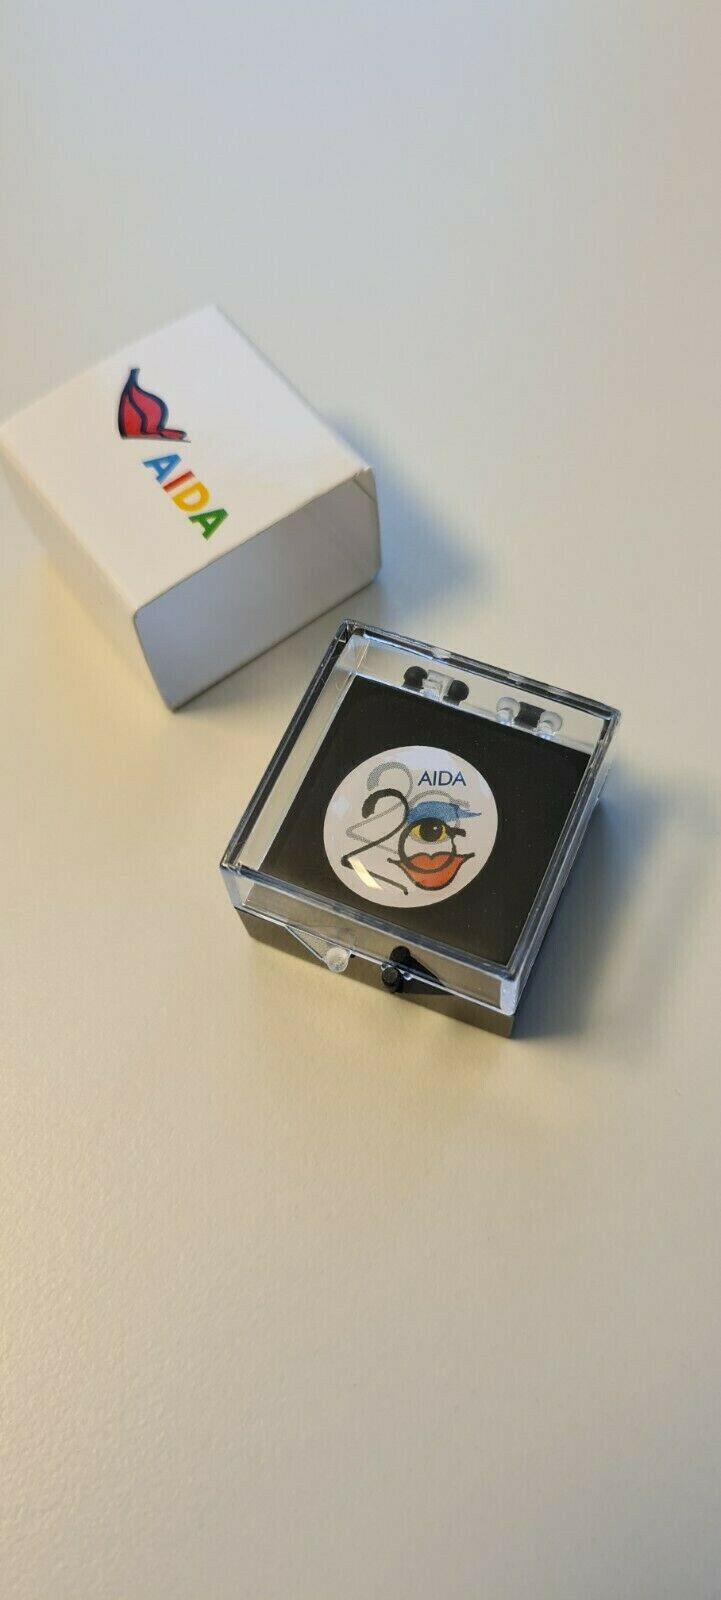 AIDA Pin 2020 NEU in Geschenkbox